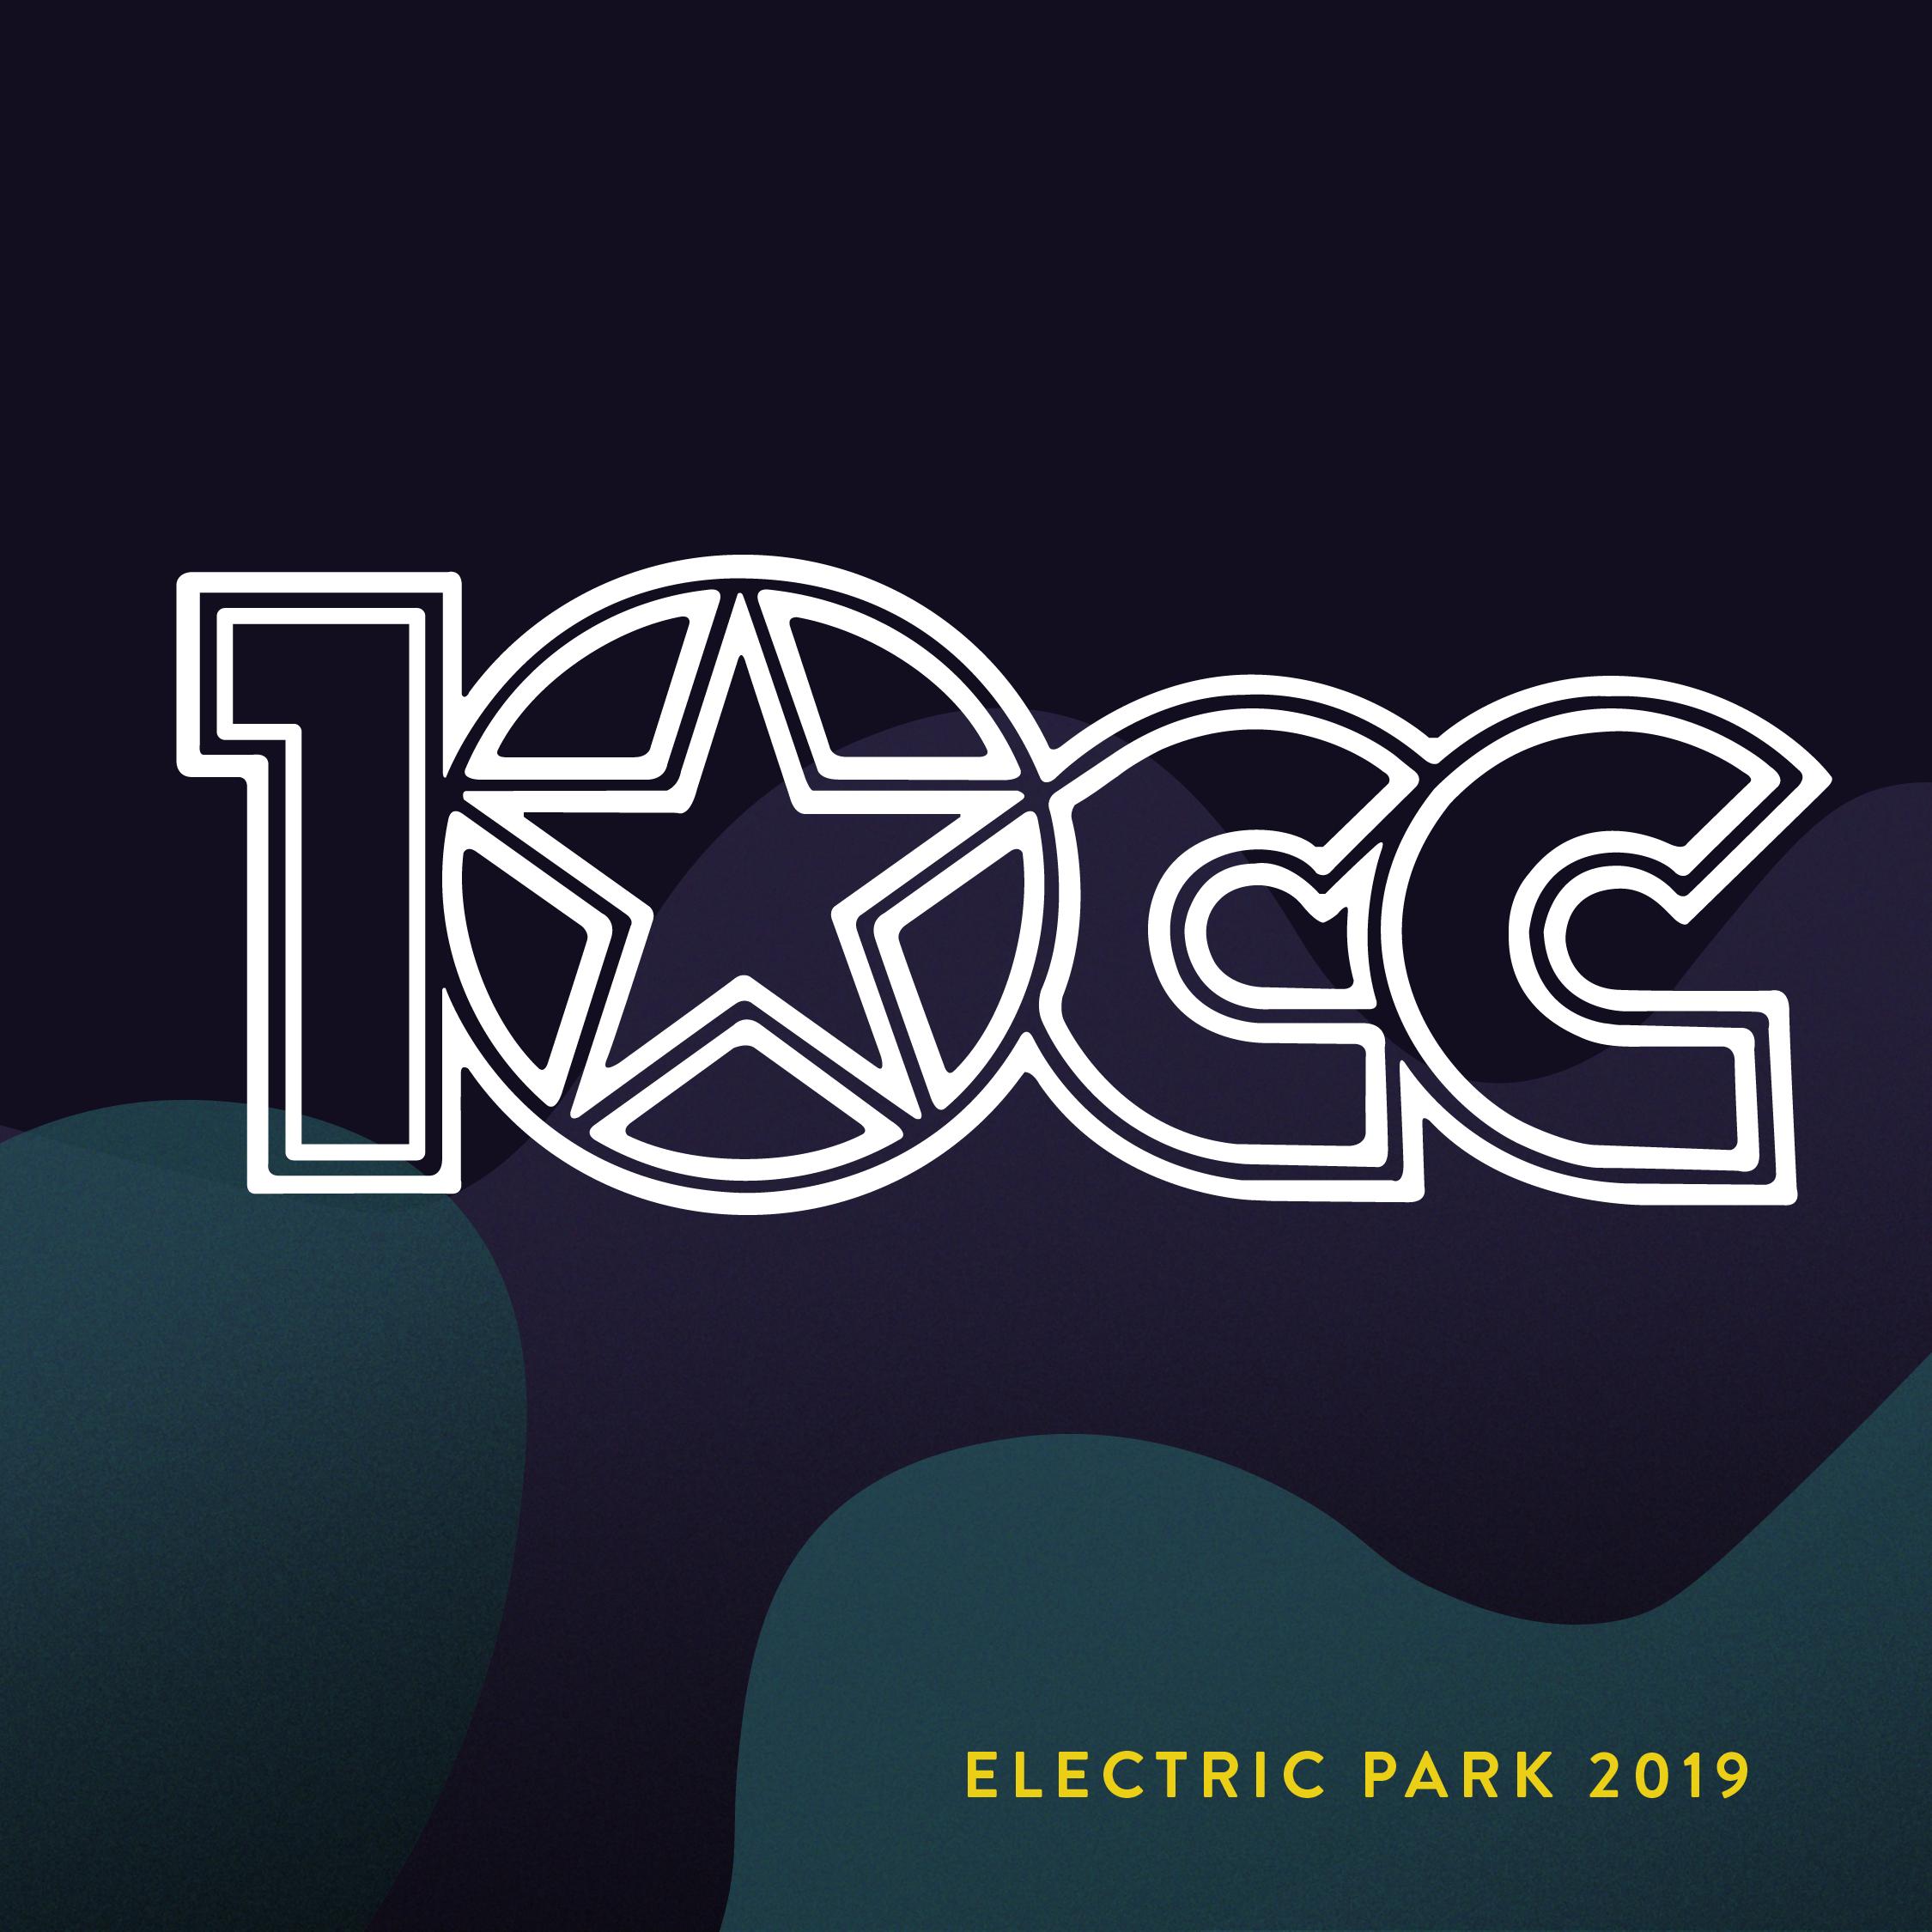 10cc logo.png